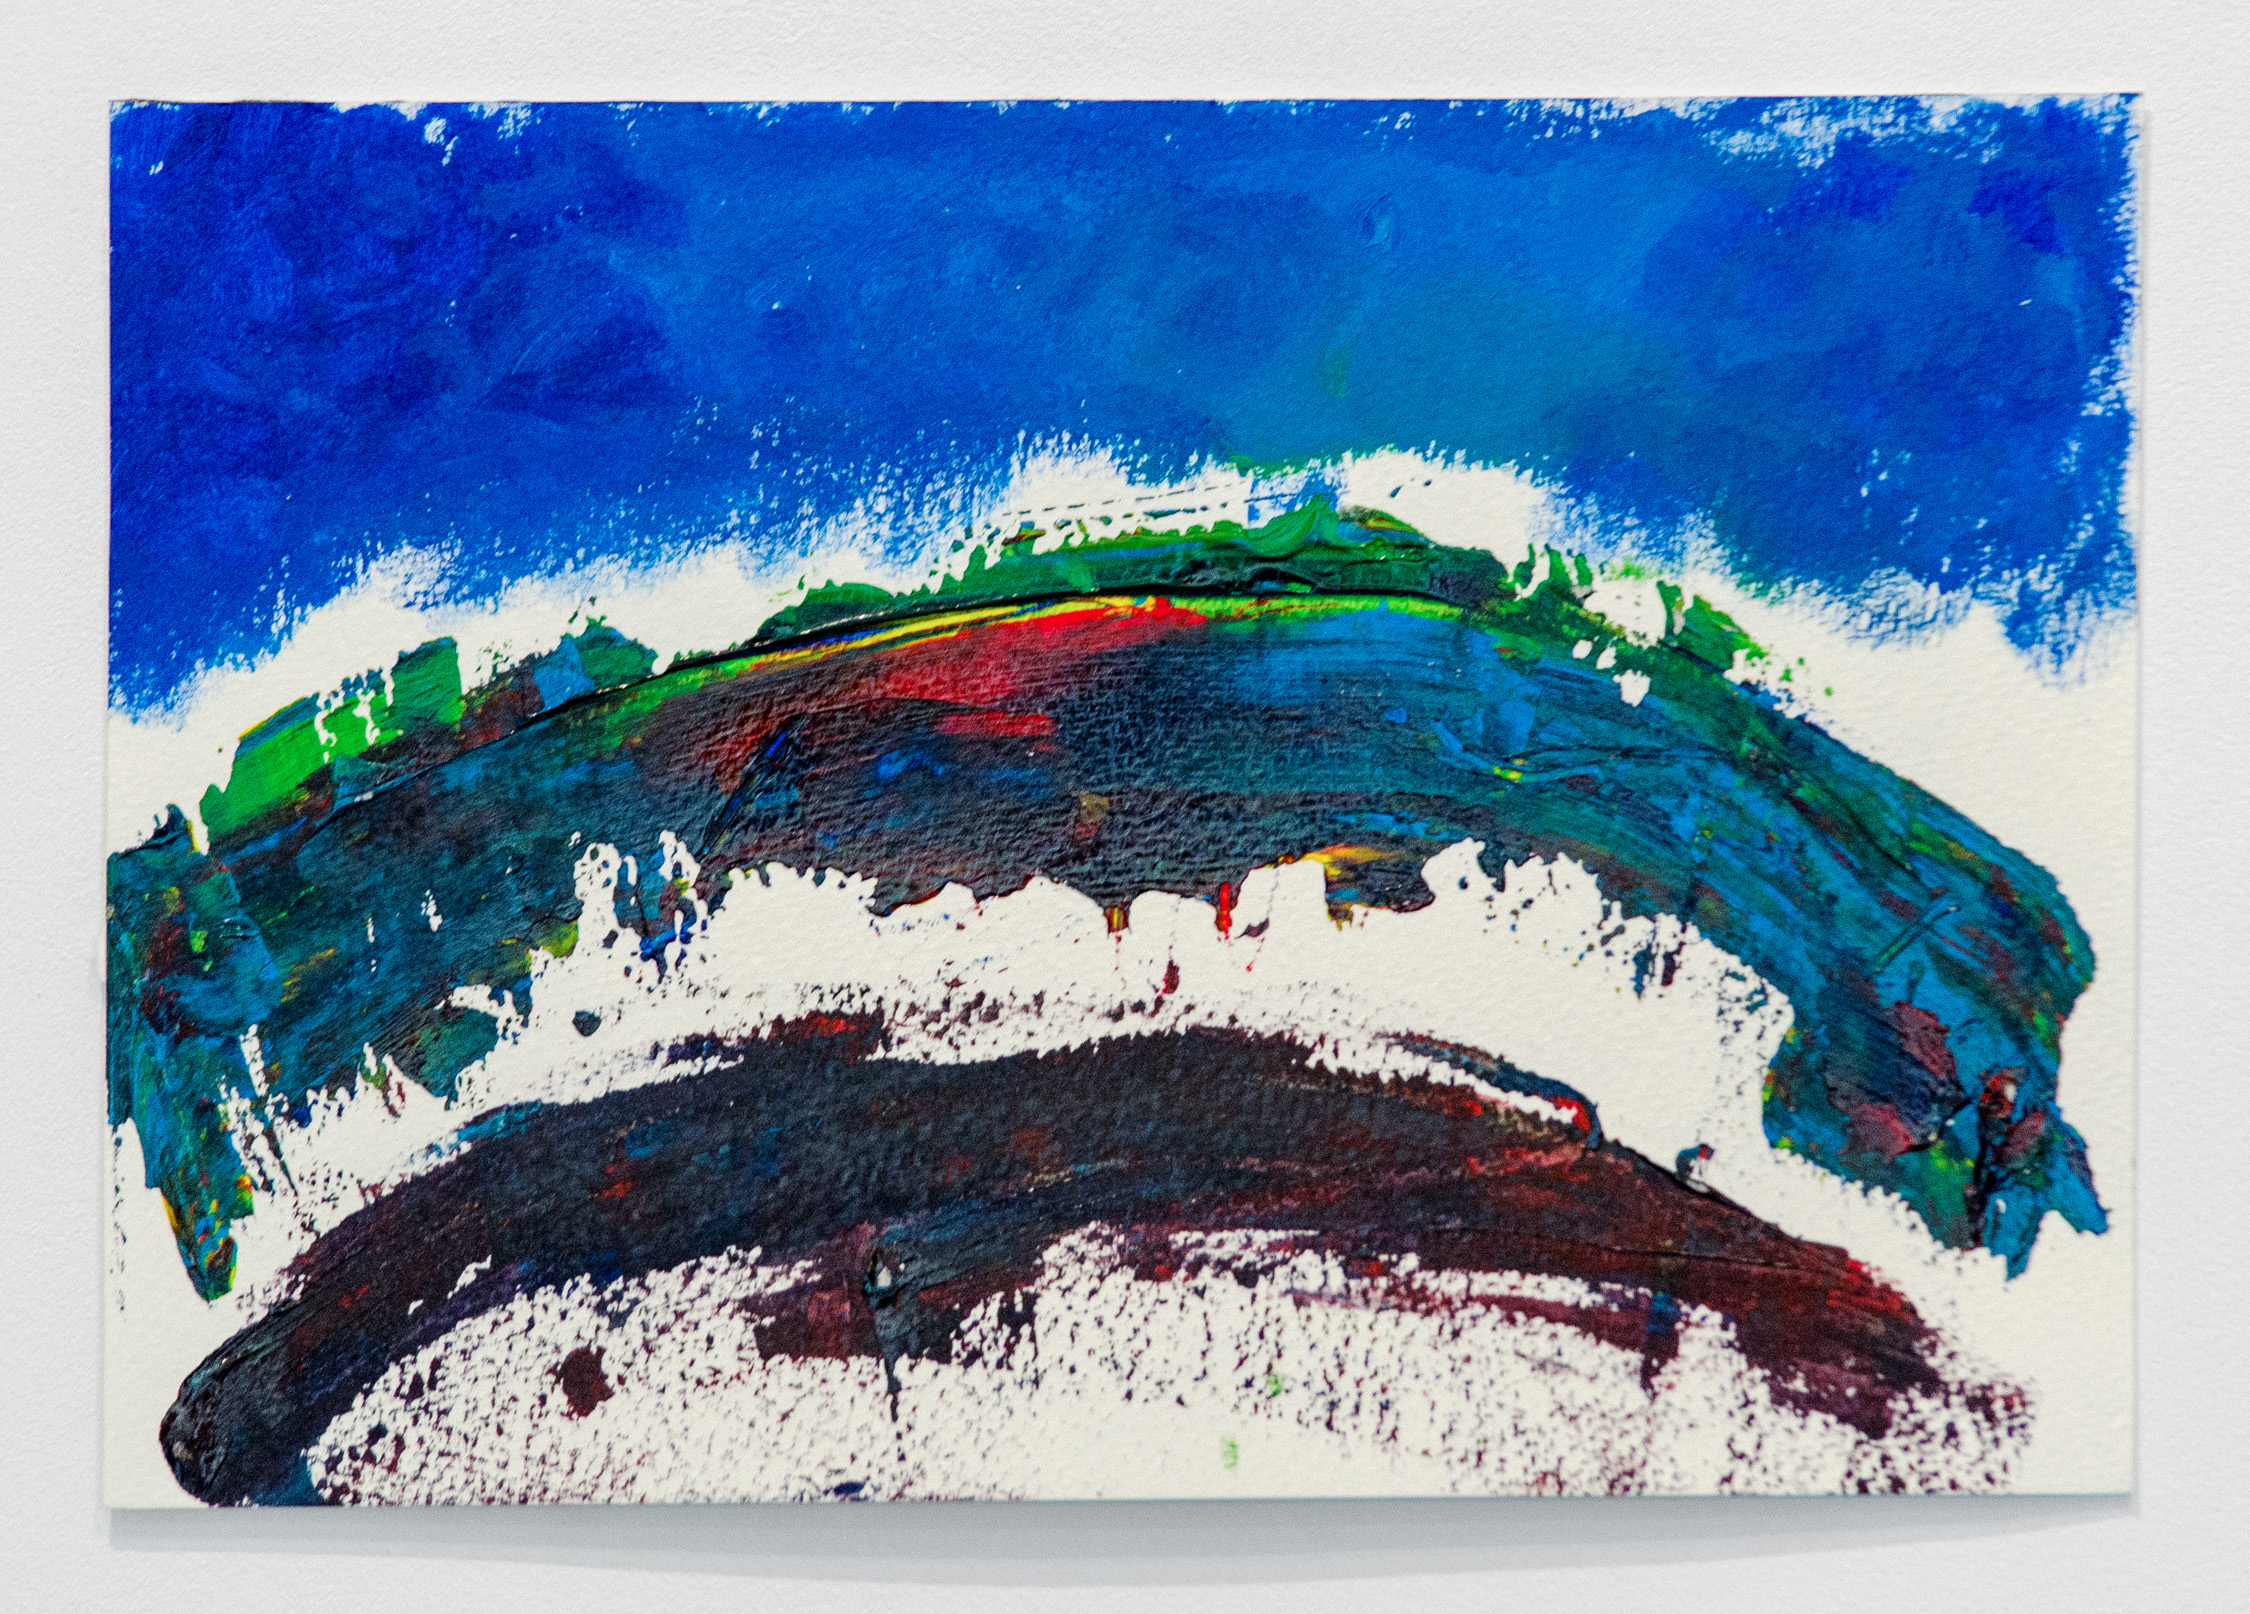 Alexia D'Monte ,   The Rainbow Bridge,  2019, Acrylic paint on watercolor paper, 7 x 10.5 inches (17.5 x 26.5 cm)